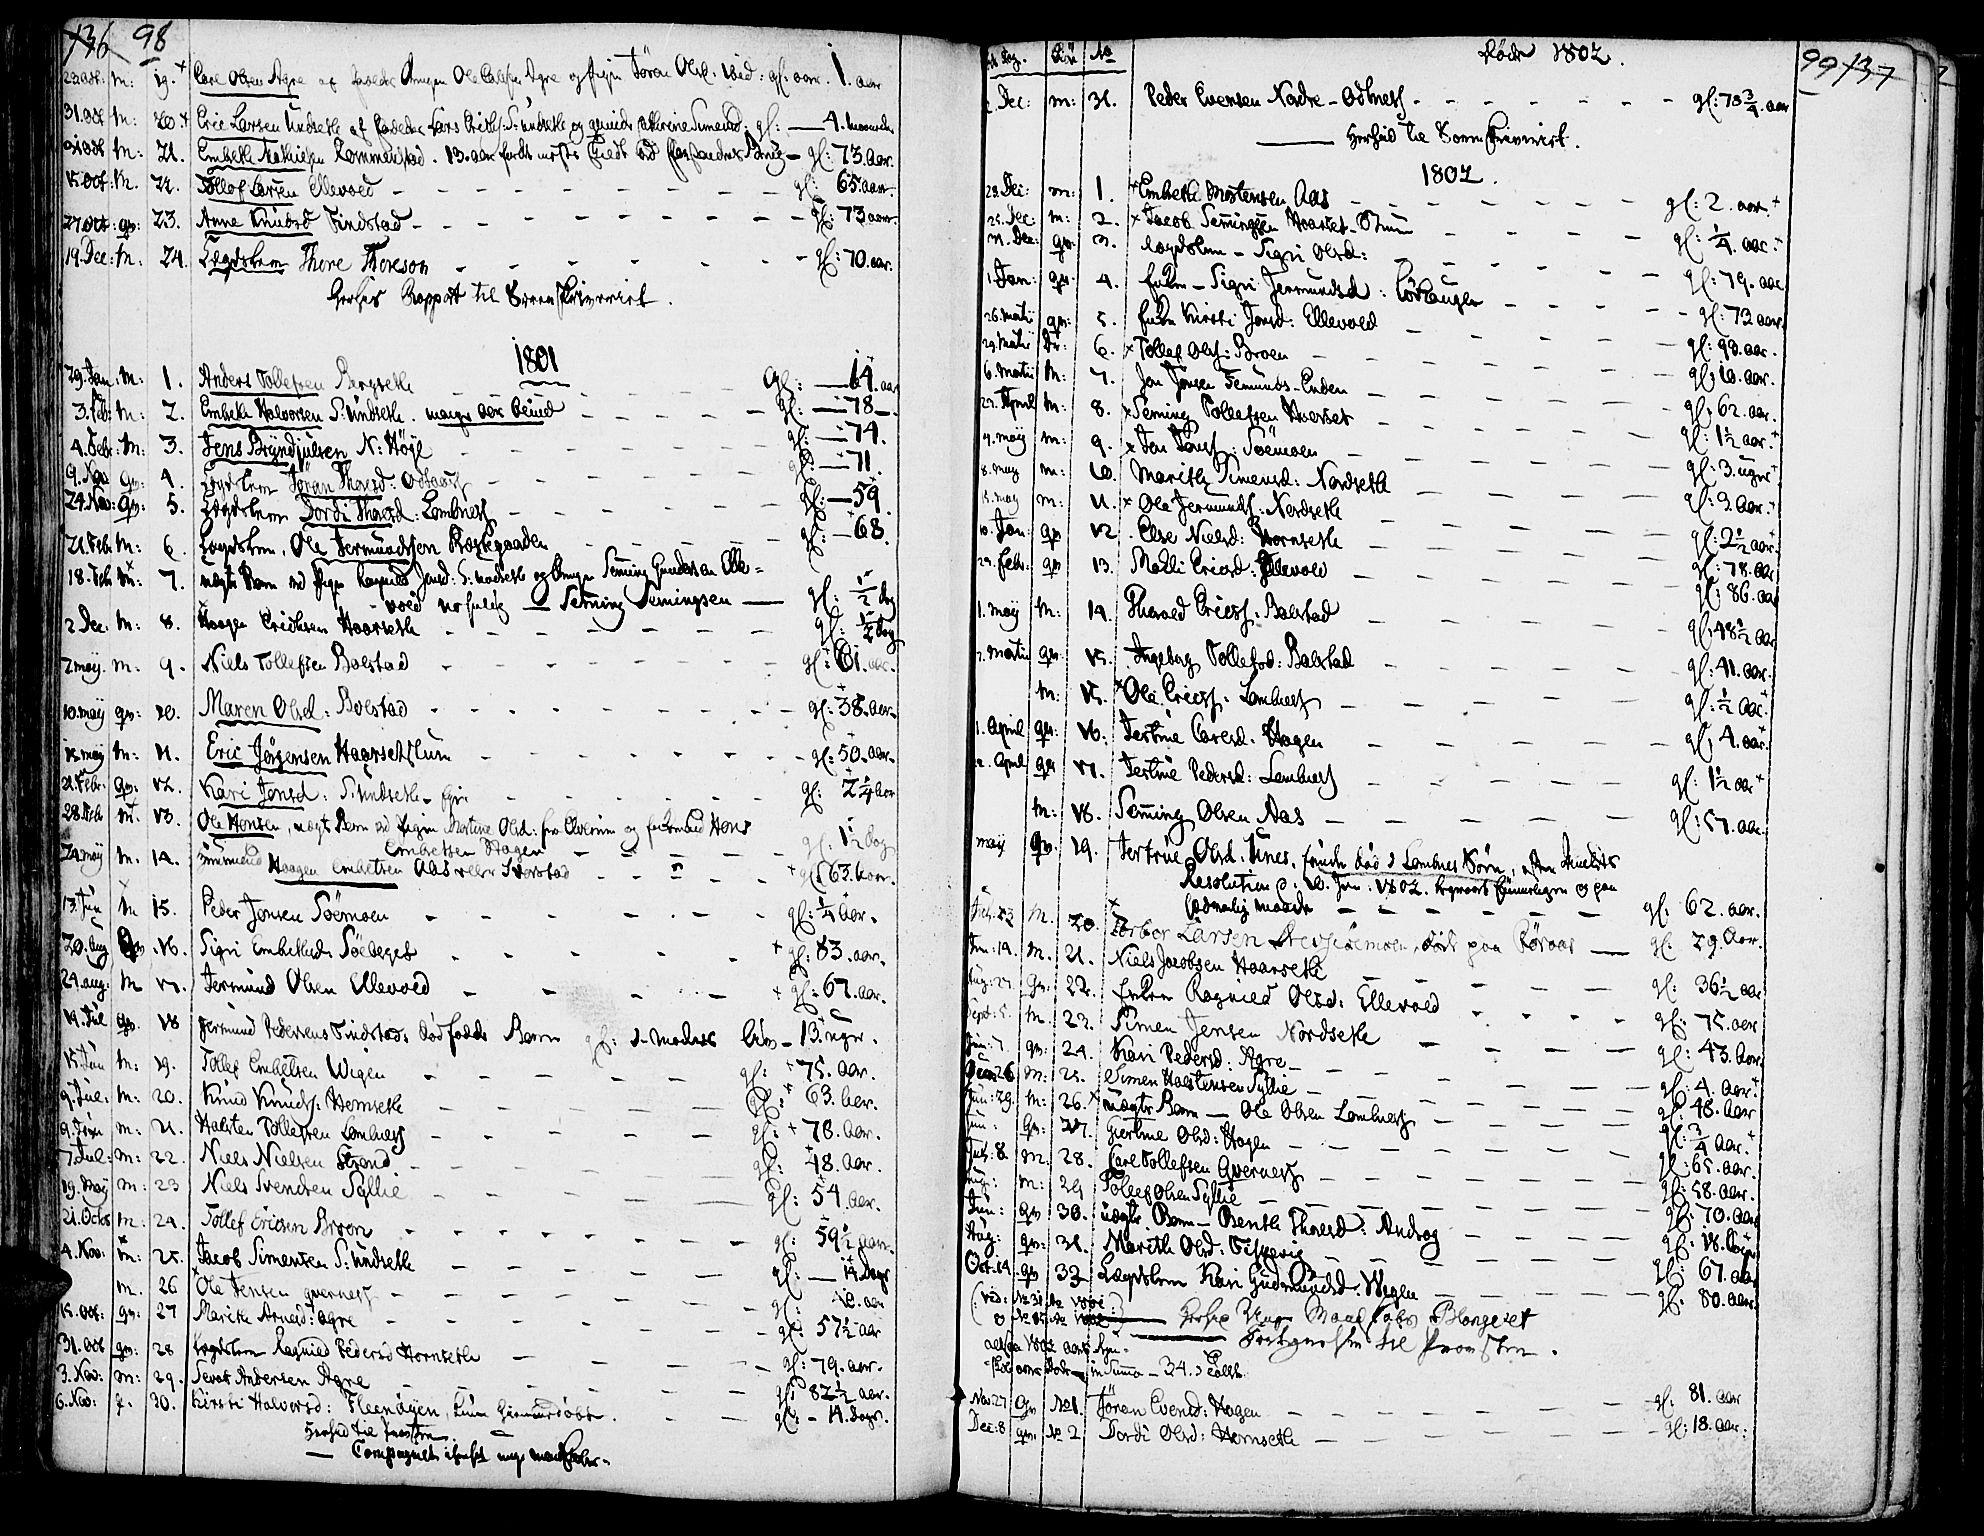 SAH, Rendalen prestekontor, H/Ha/Haa/L0002: Ministerialbok nr. 2, 1788-1814, s. 98-99